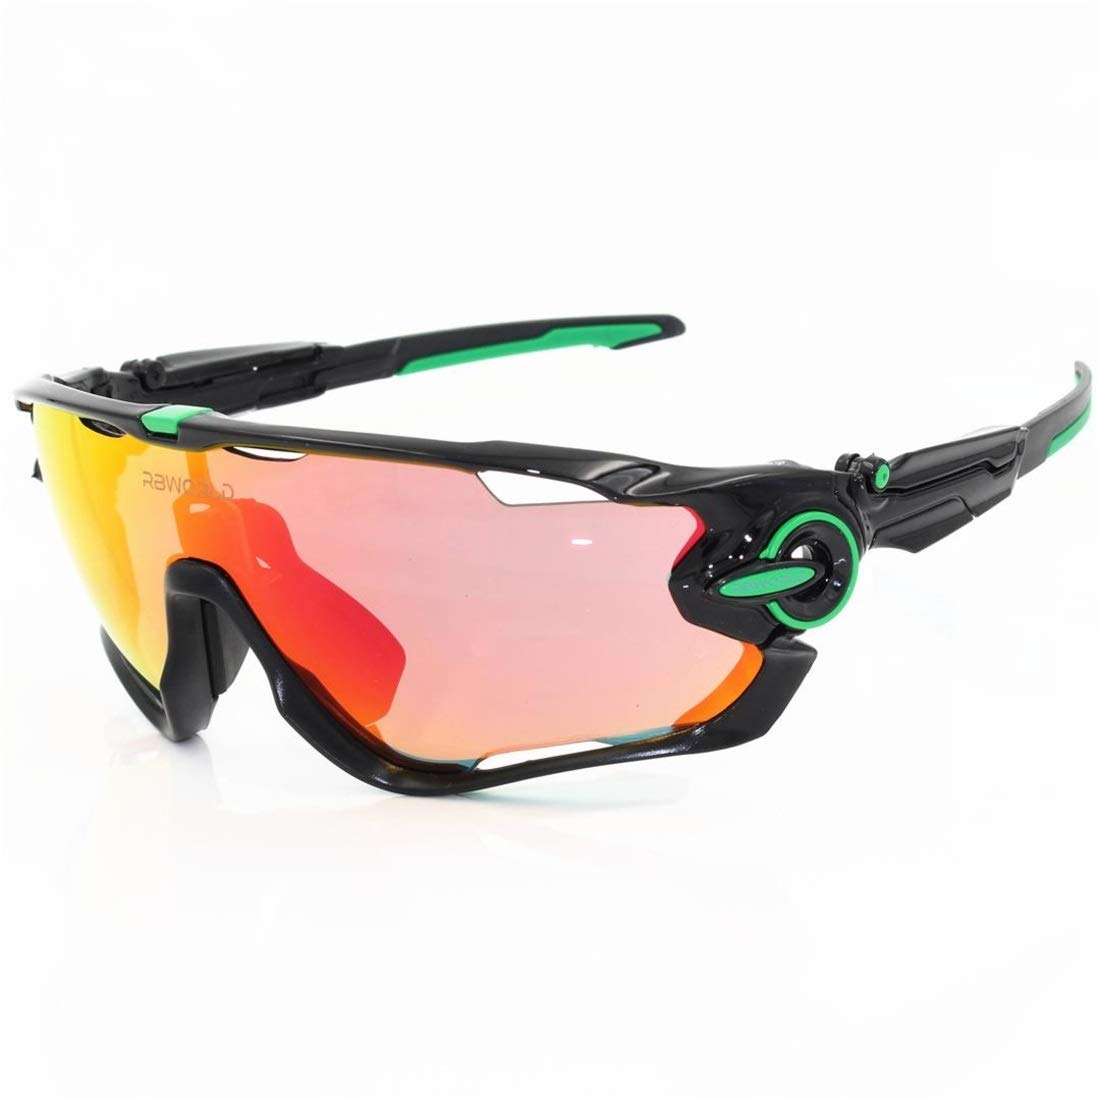 BAOYIT Polarized Sports Riding Glasses Transparent Color Glasses for Women (Color : E) by BAOYIT